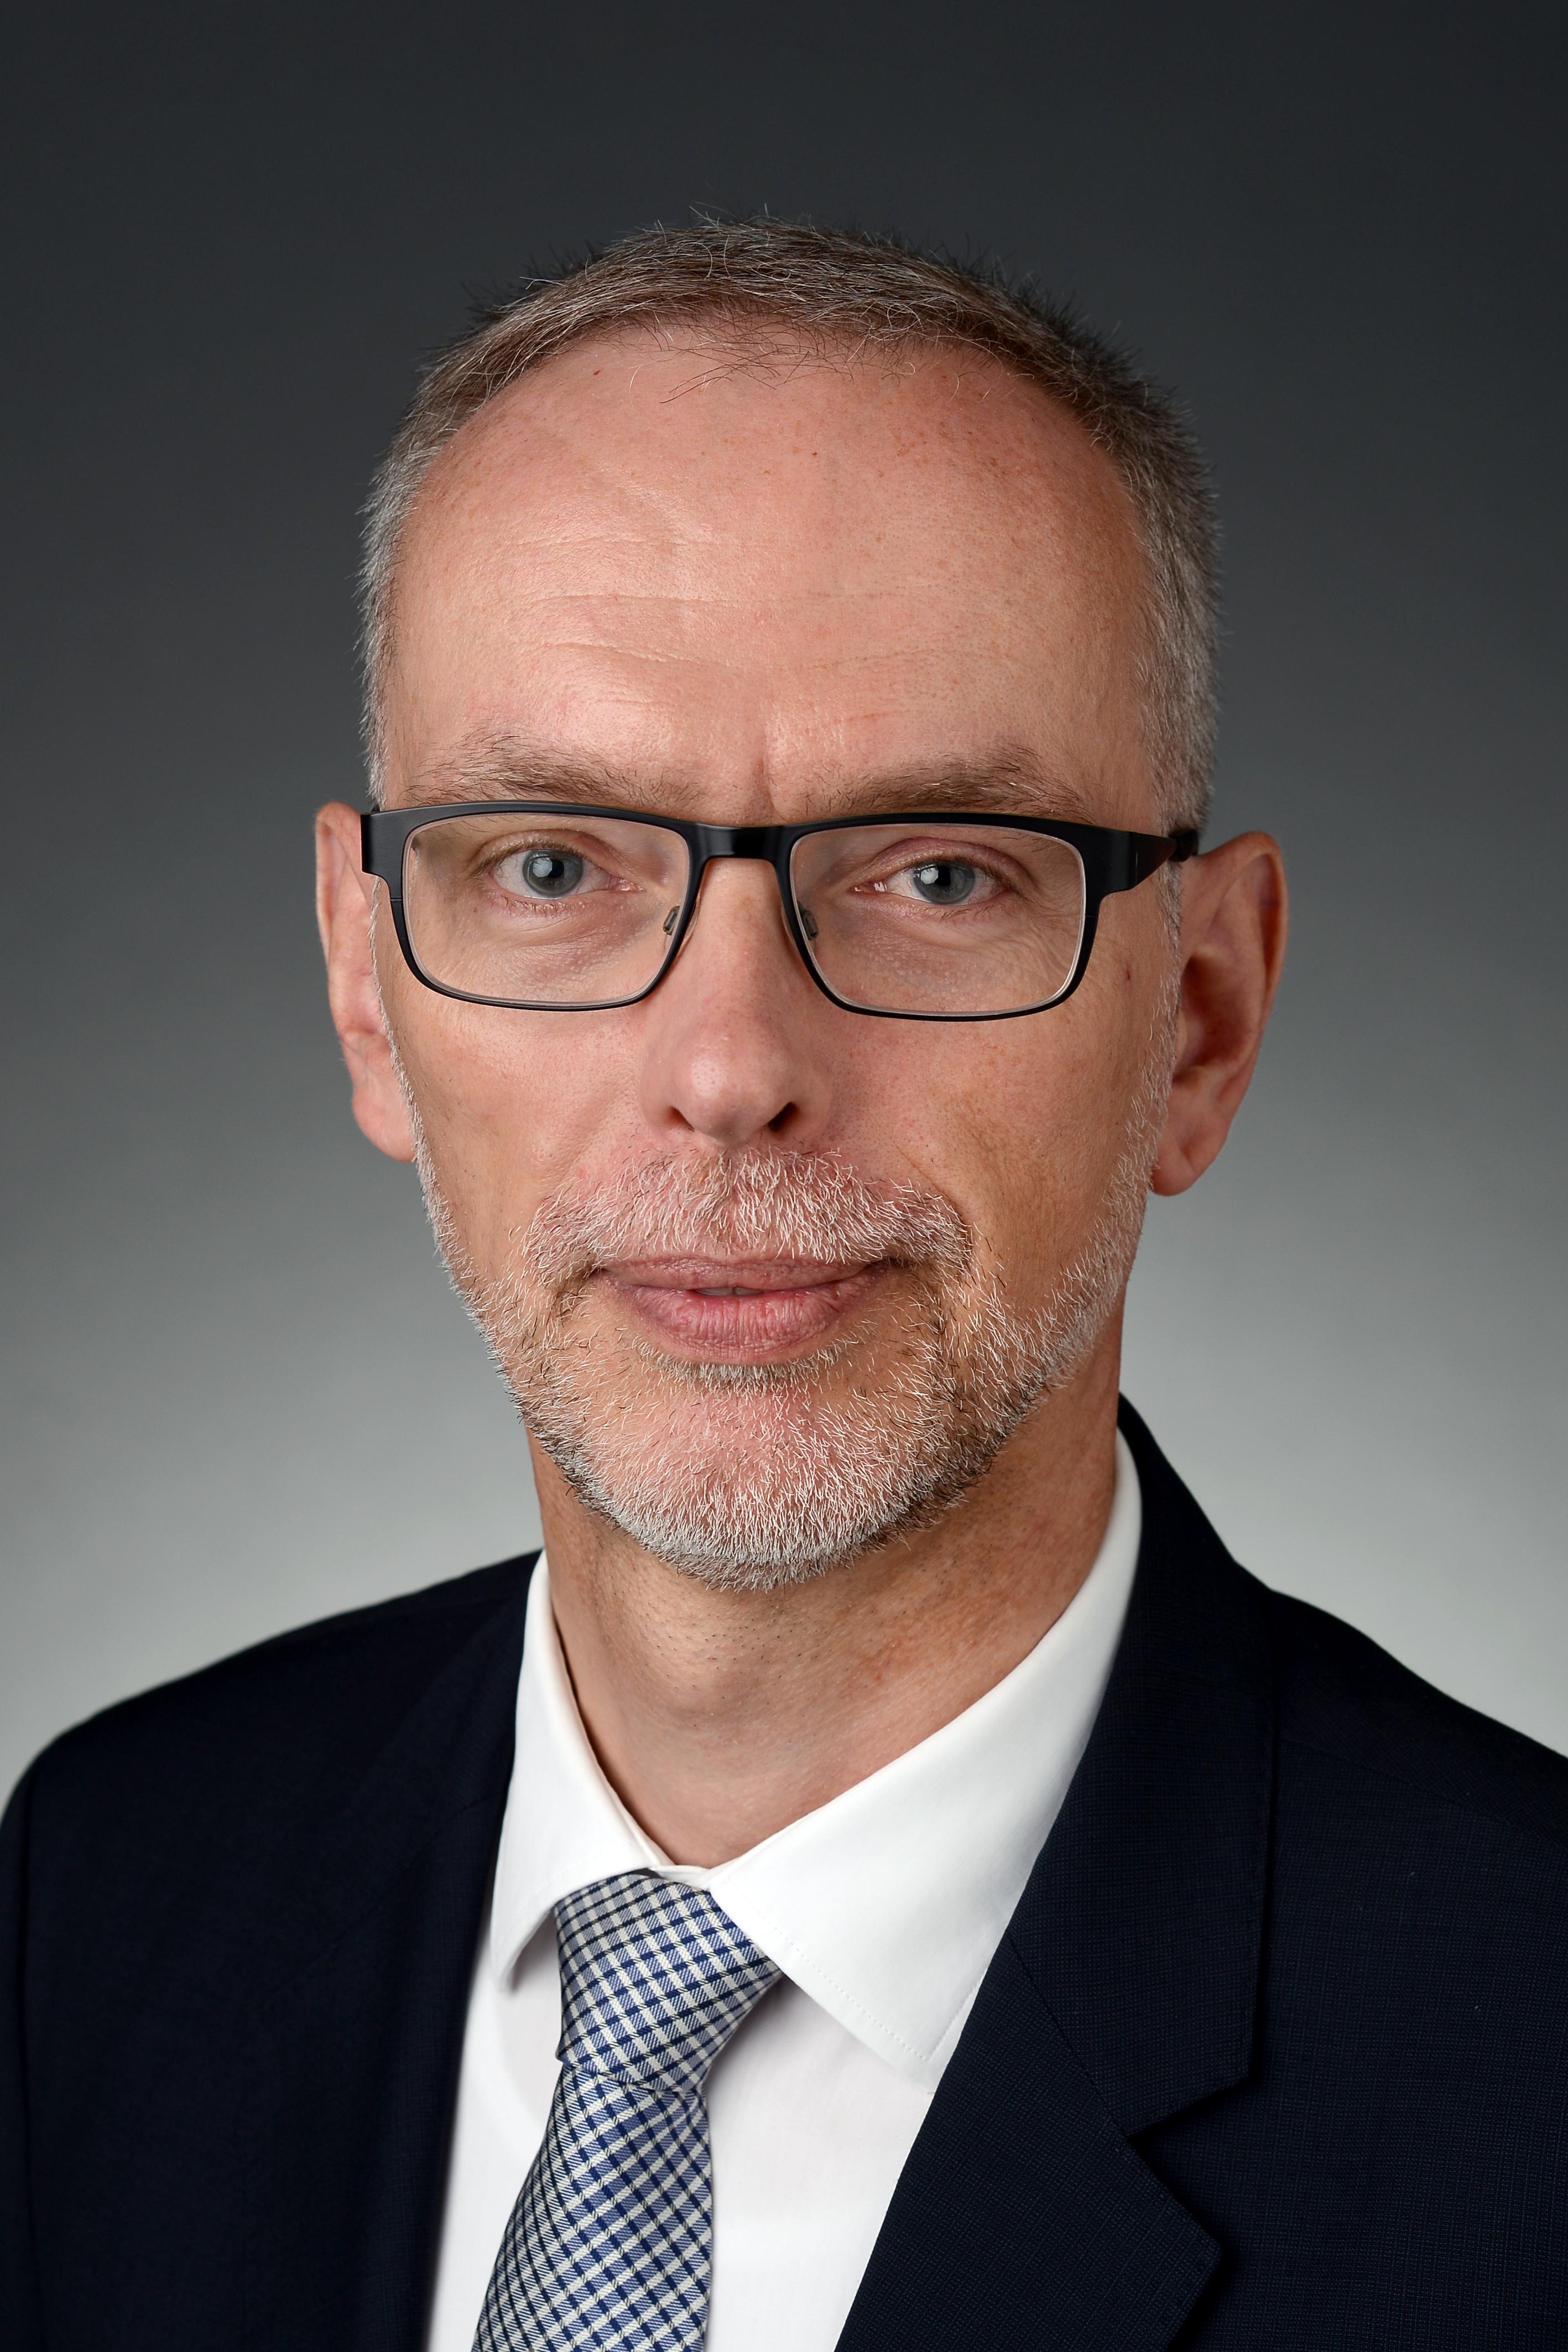 Patrick Graber